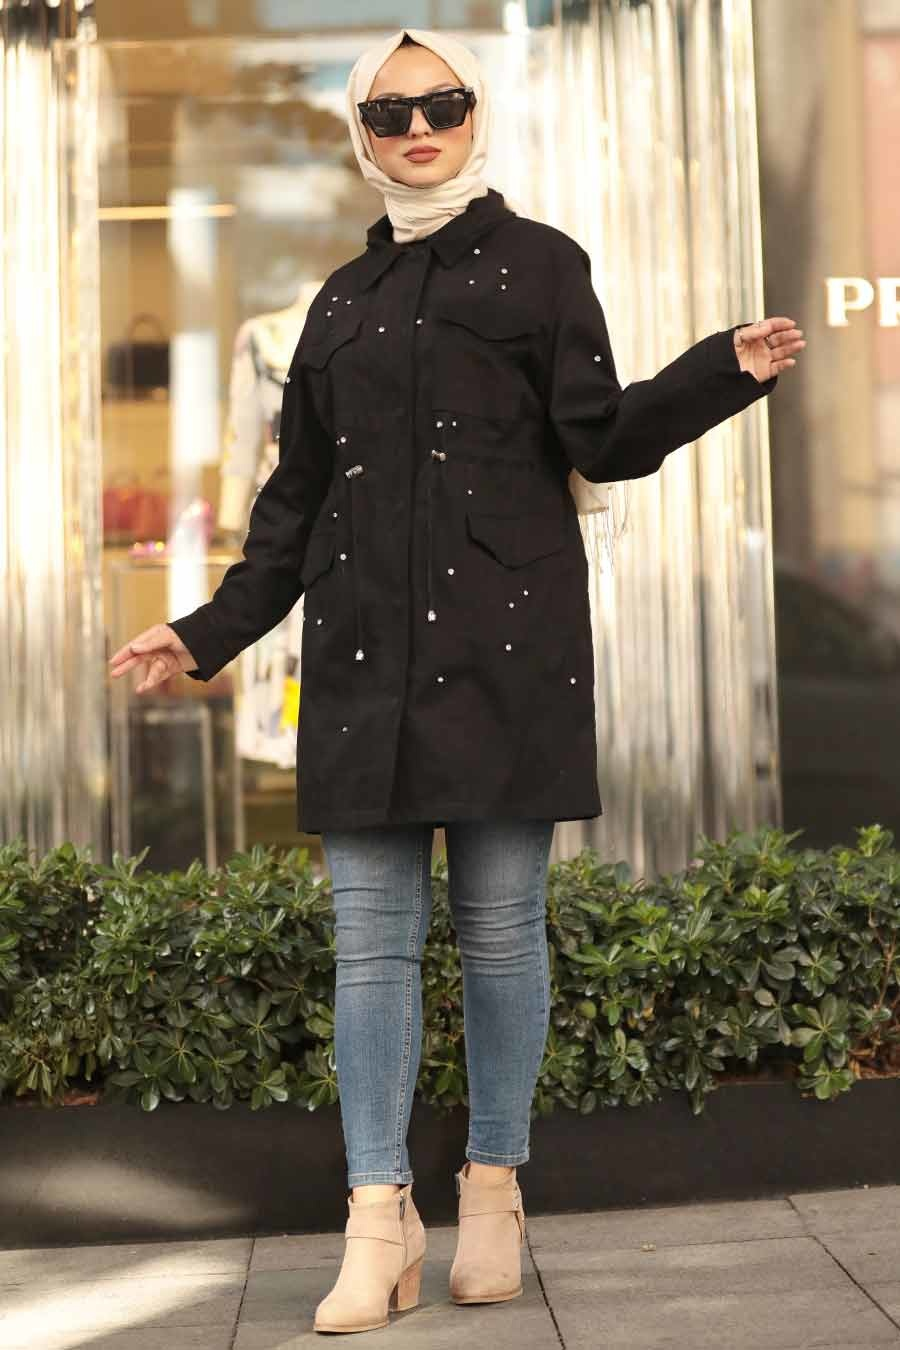 Neva Style - Black Hijab Coat 9025S